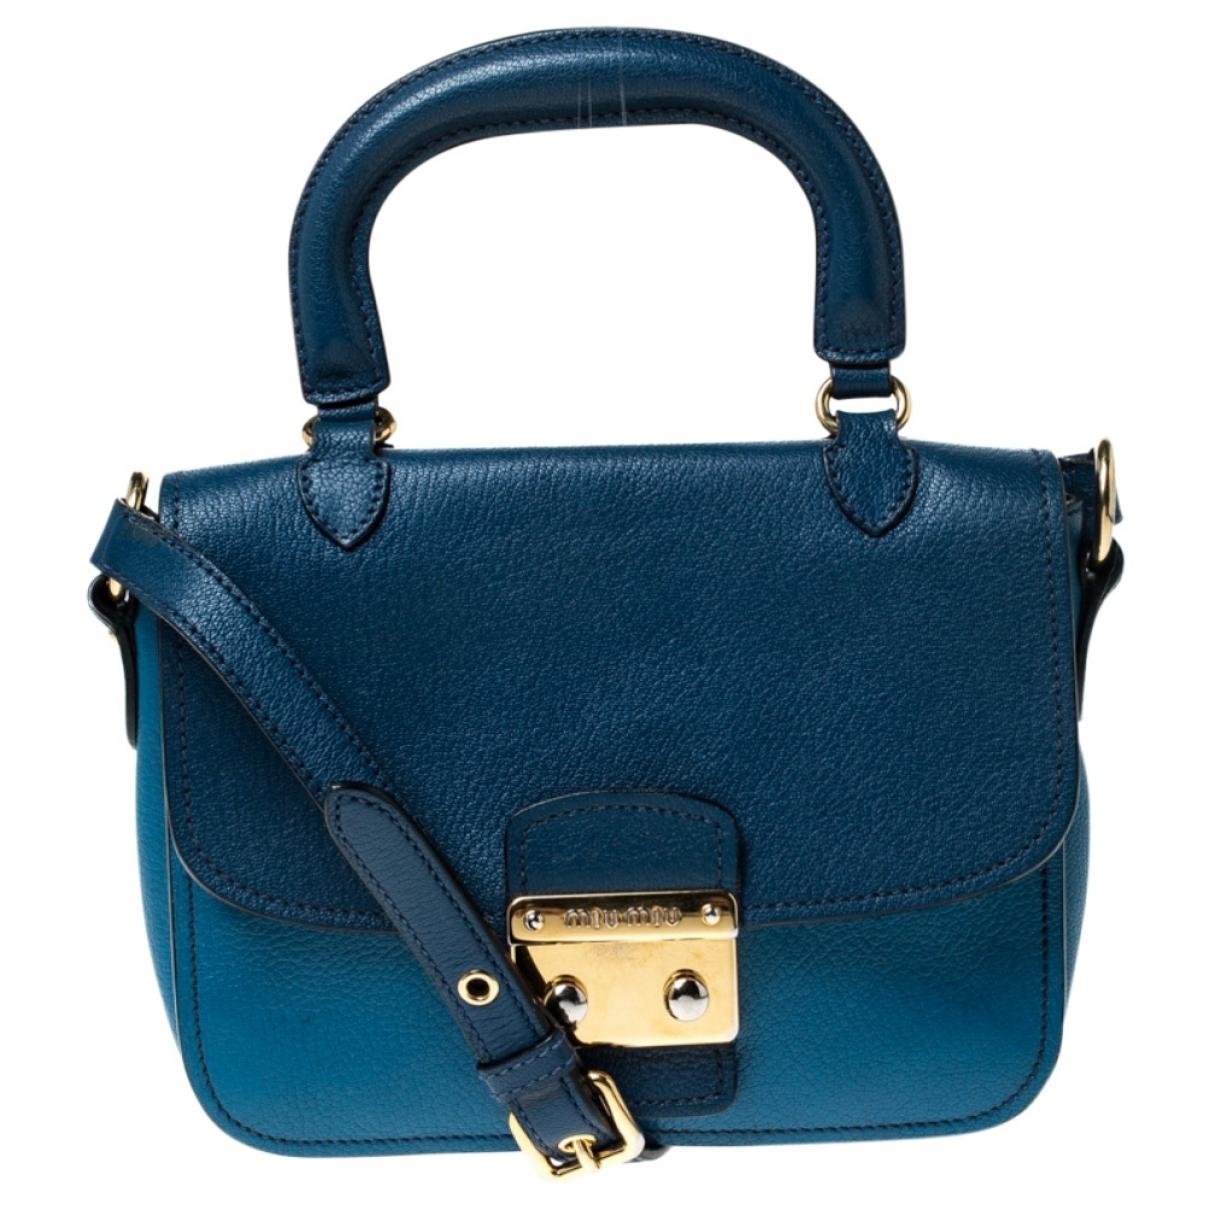 Miu Miu Madras Blue Leather handbag for Women \N